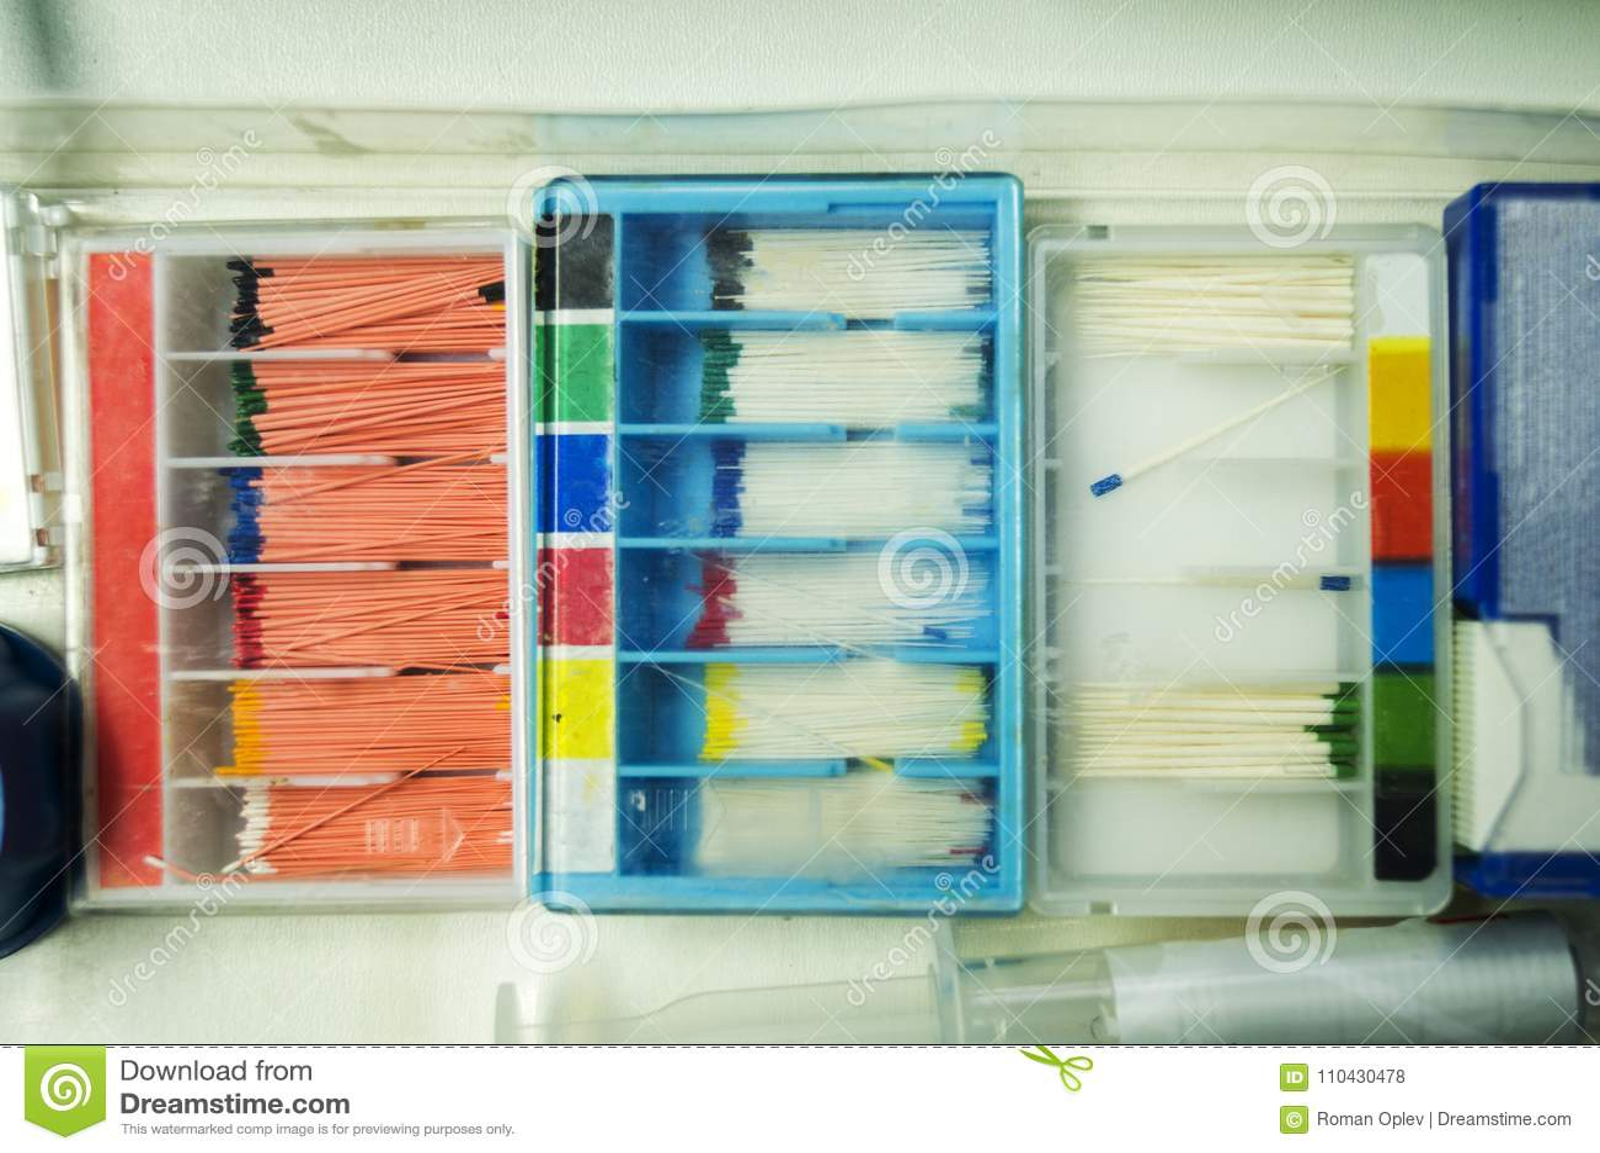 Boksuje z setem stomatologiczne szpilki różnorodni rozmiary